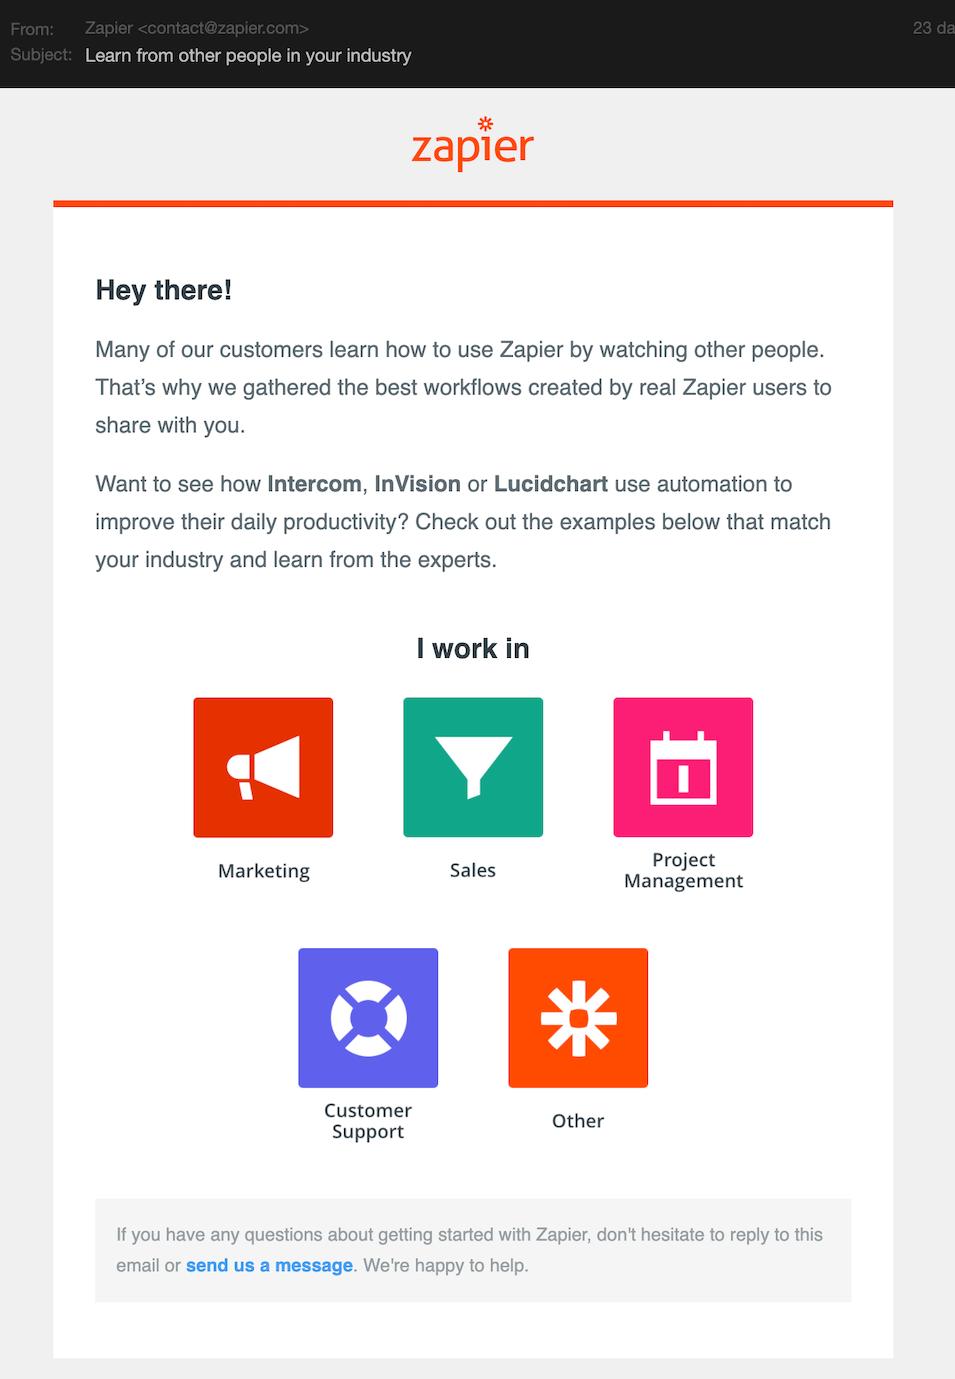 Zapier onboarding email